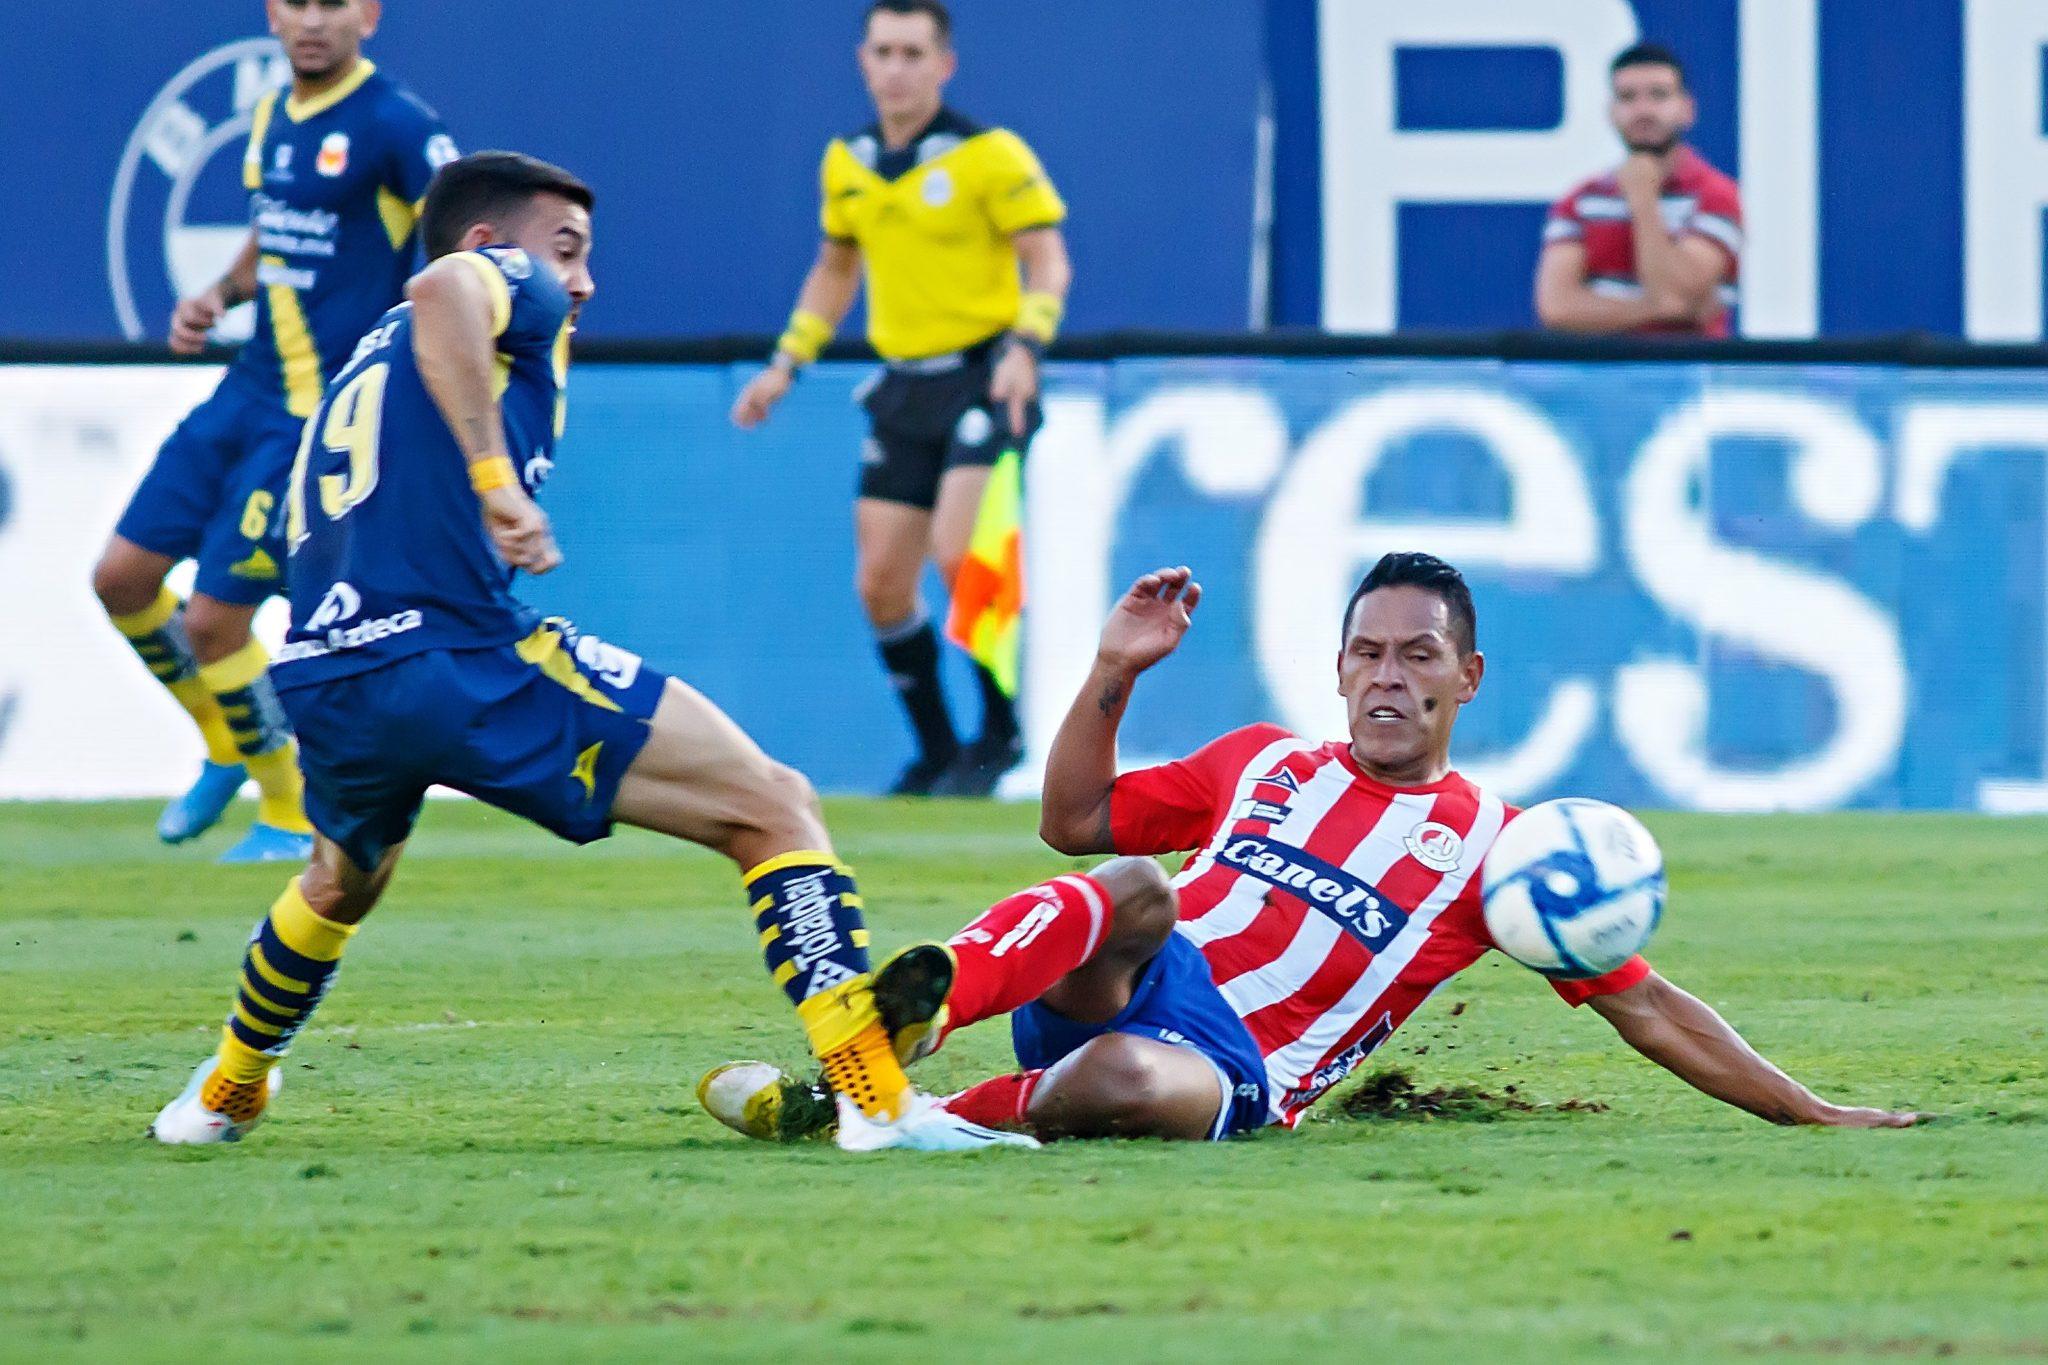 San Luis empató con Morelia. Foto: Twitter